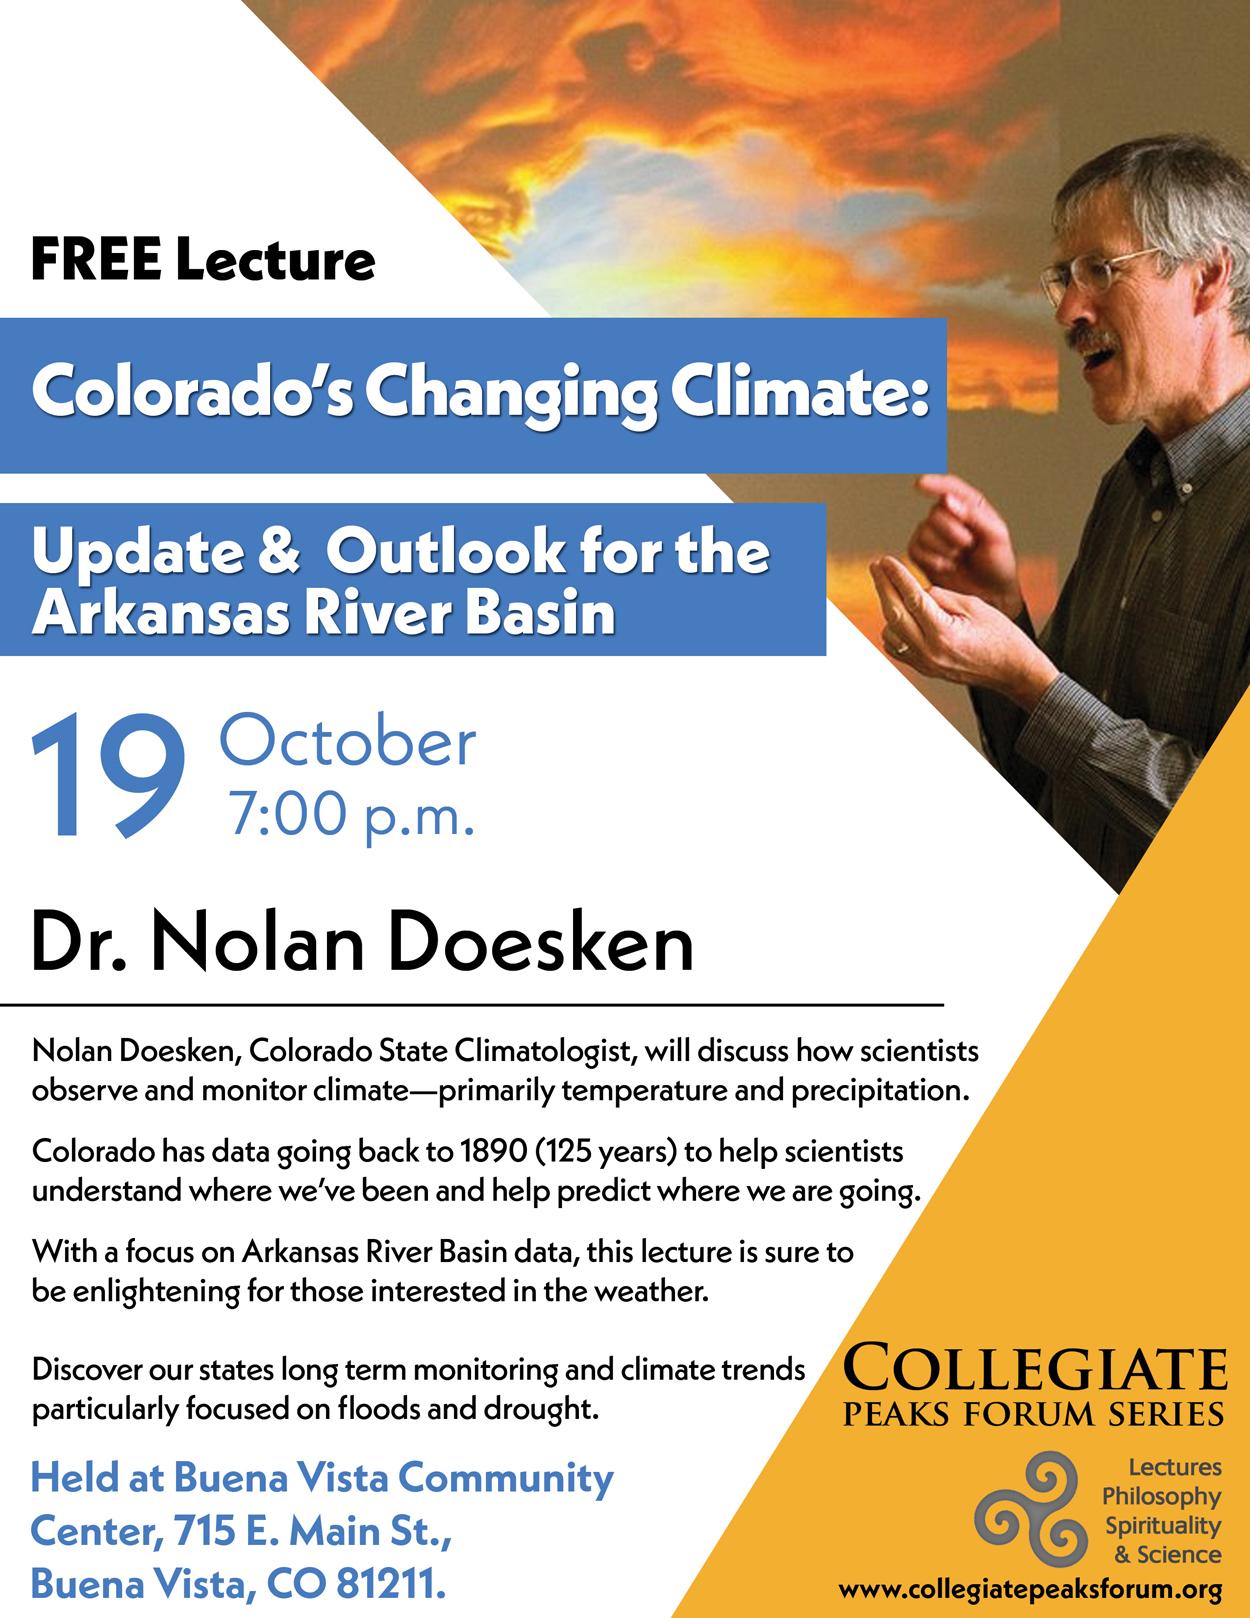 October 19, 2017 Dr. Nolan Doesken